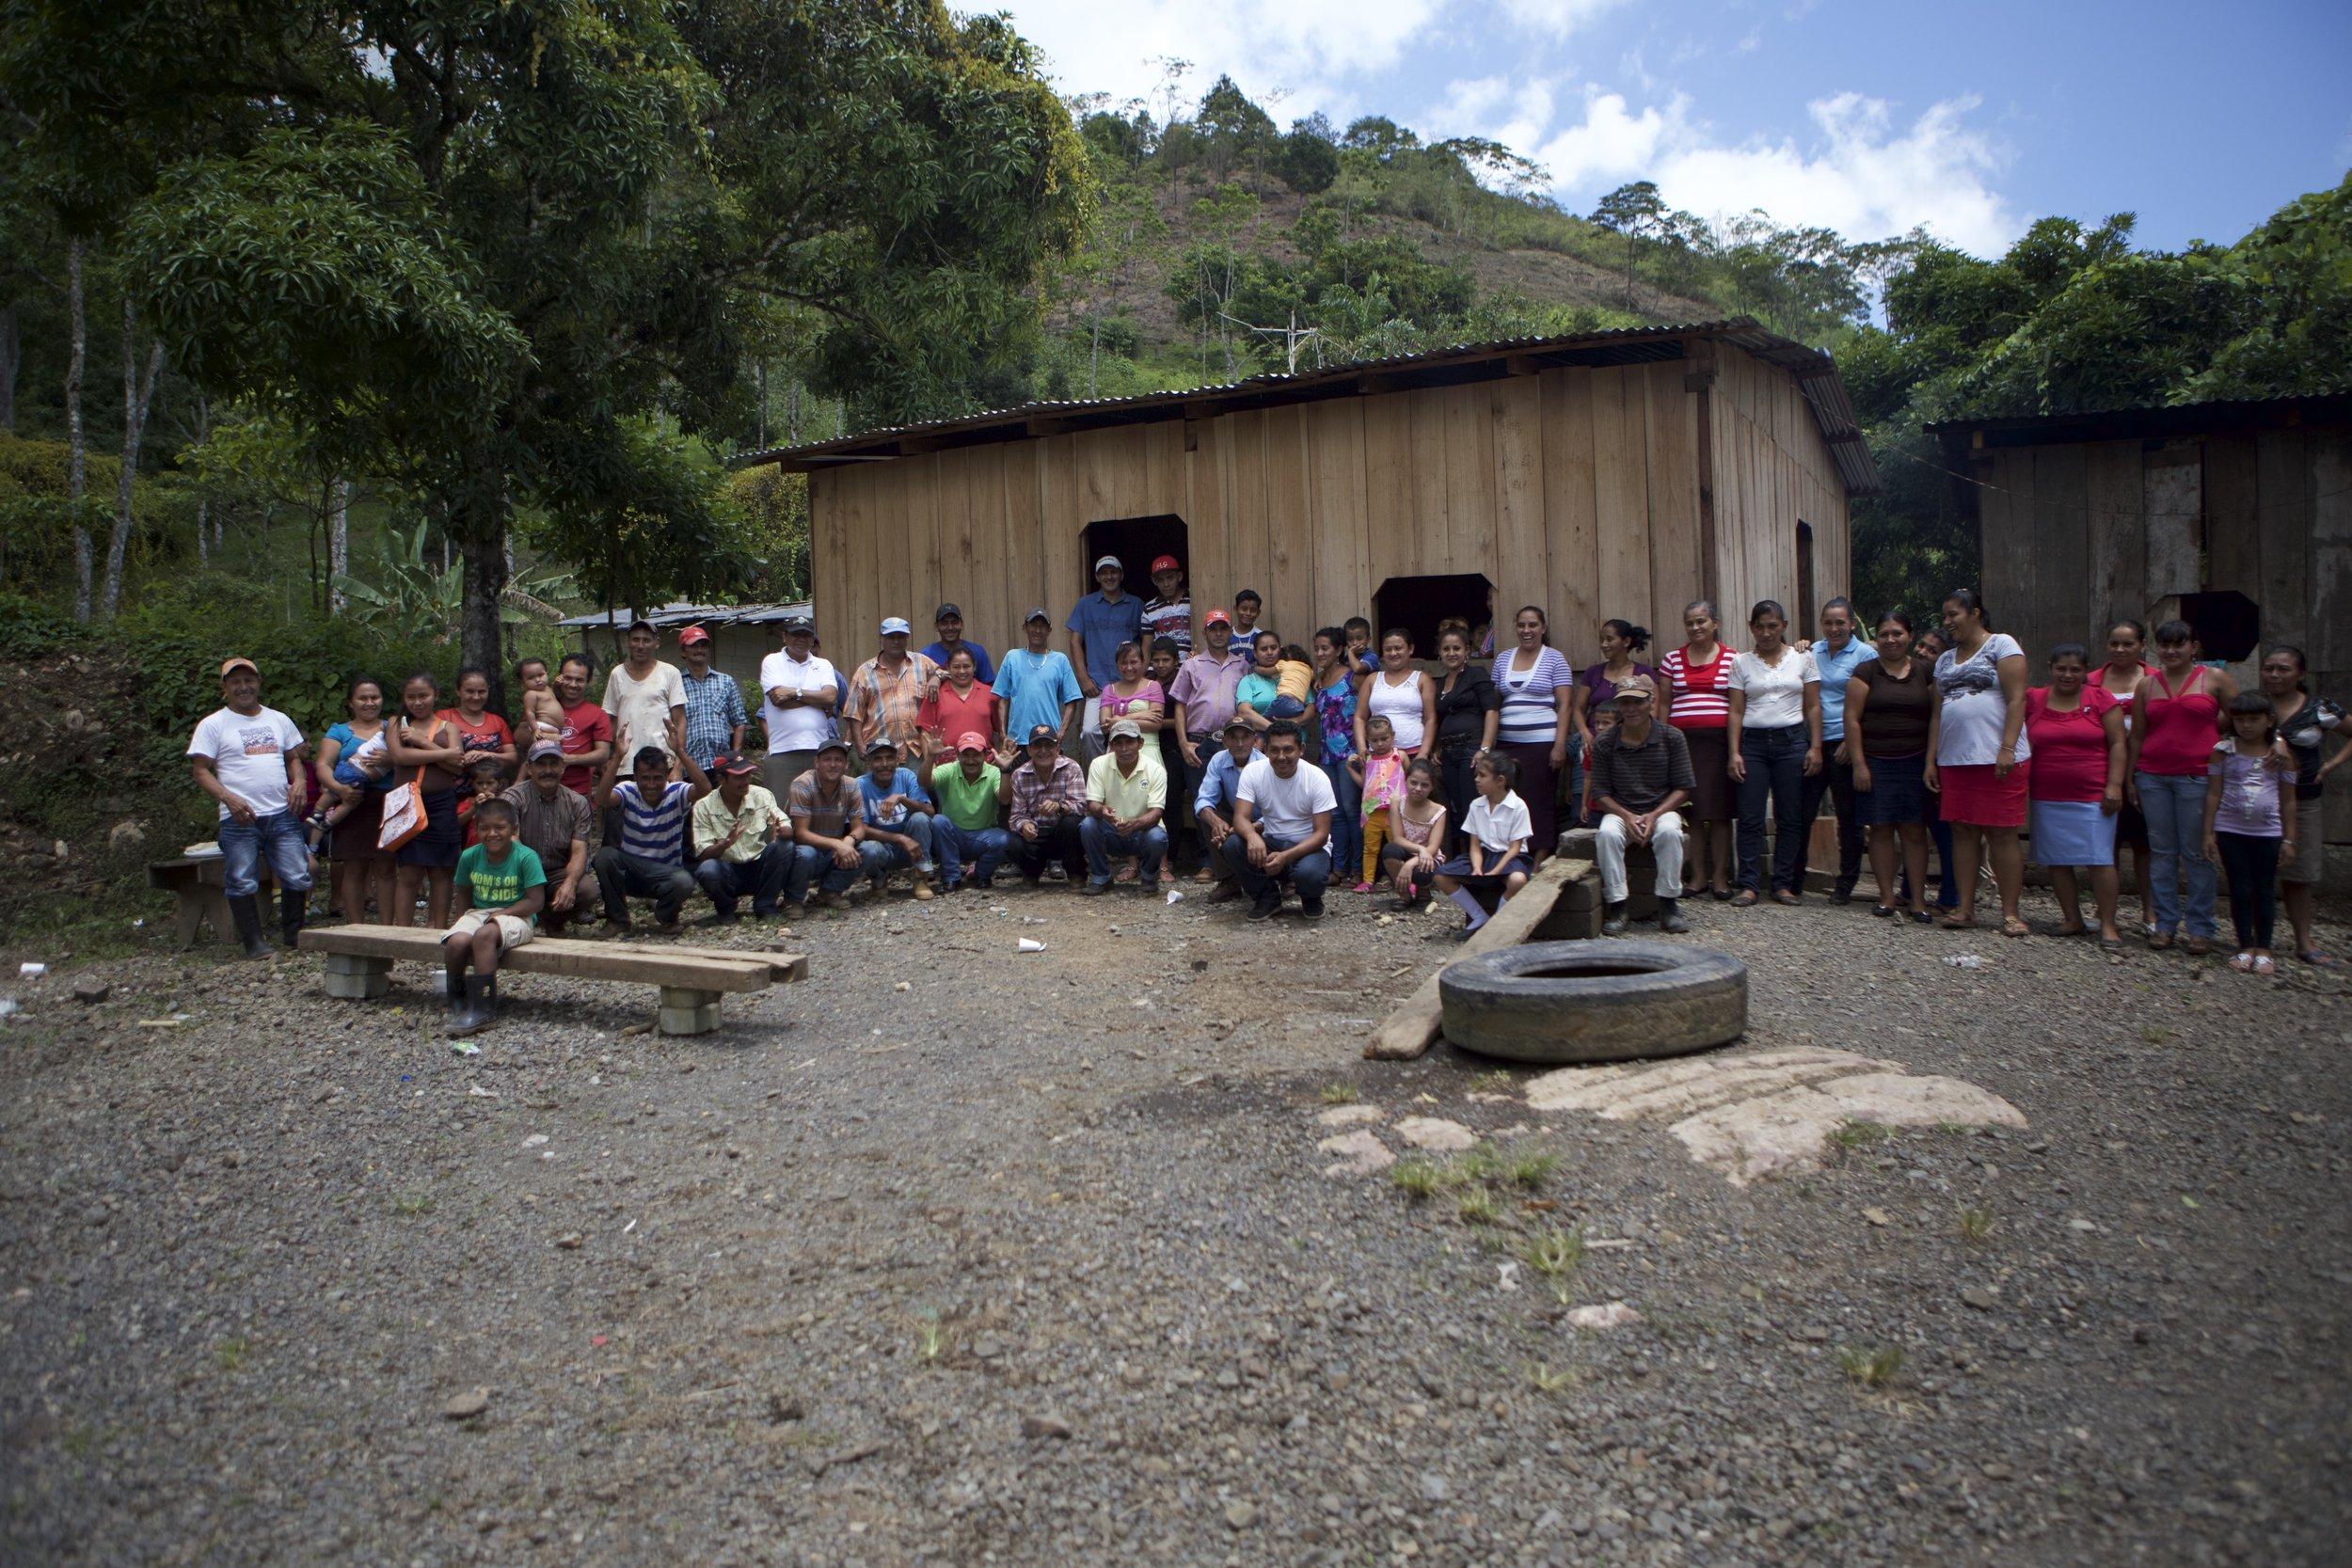 Proud community of farmers in Nicaragua